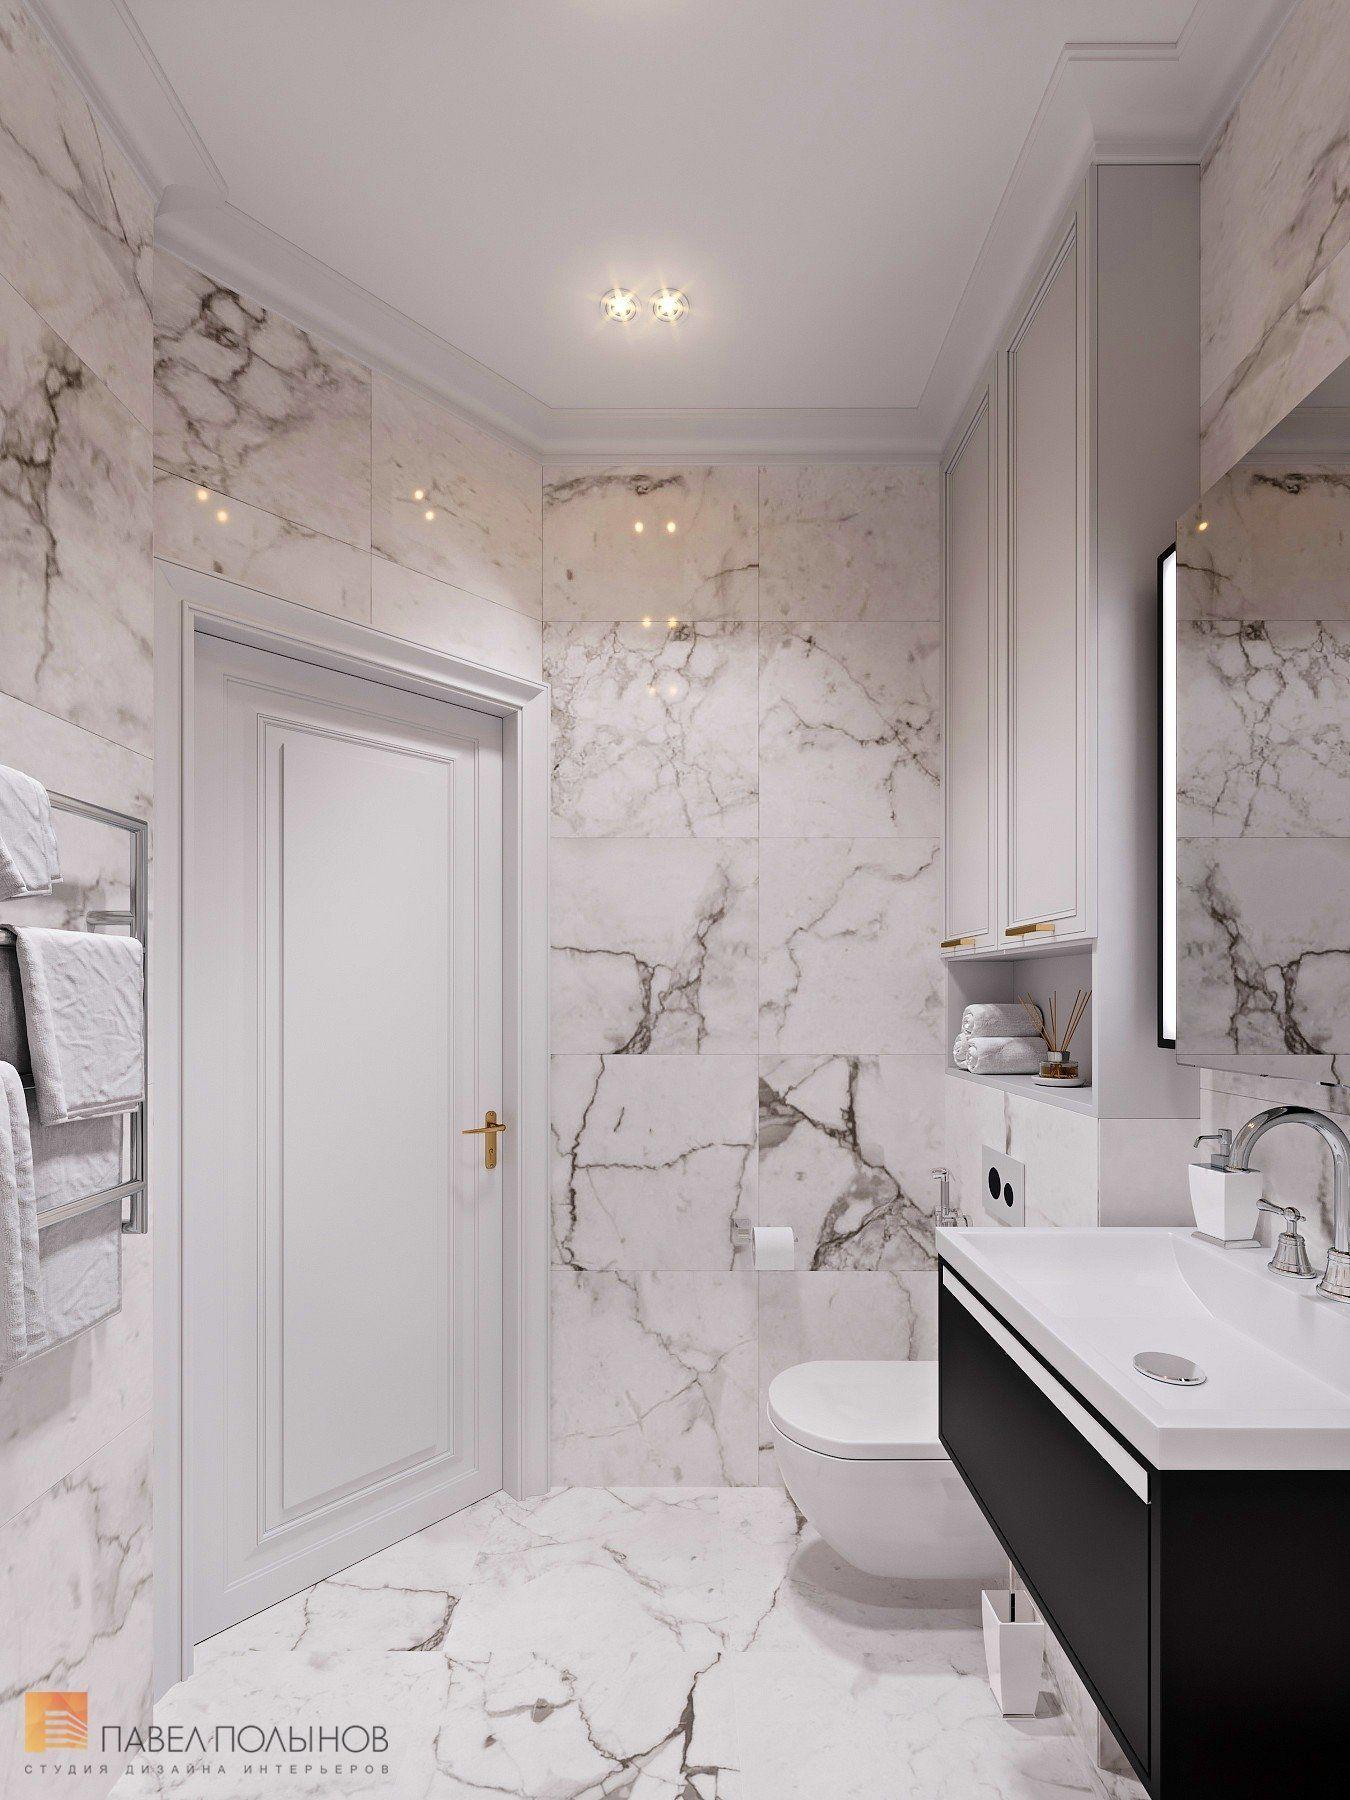 Фото интерьер ванной комнаты из проекта «Квартира с стиле ...